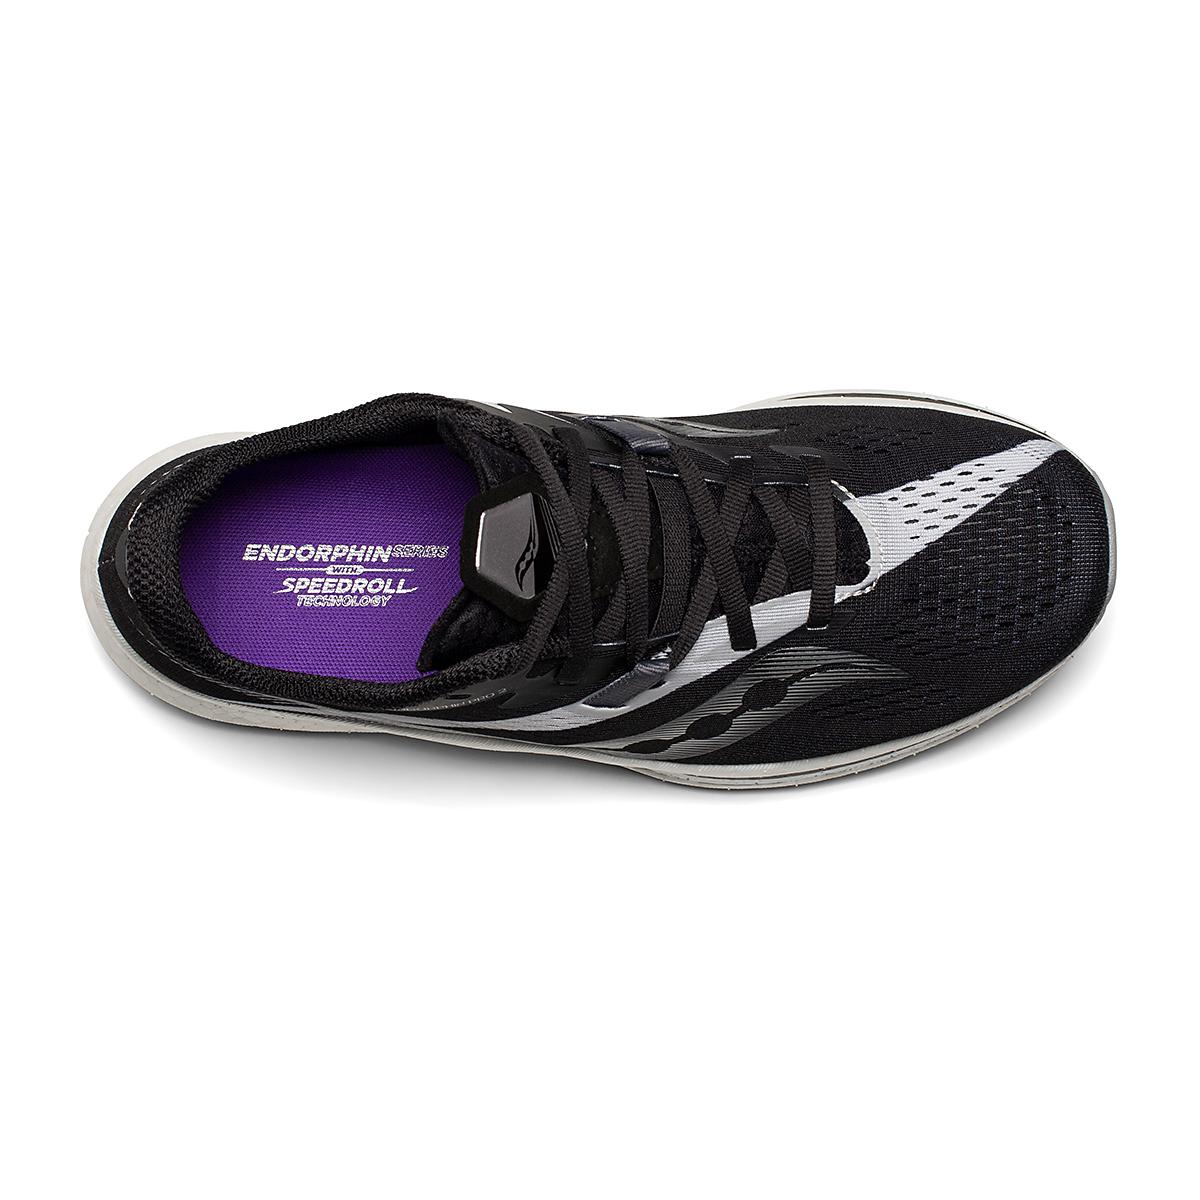 Women's Saucony Endorphin Pro 2 Running Shoe - Color: Black/White - Size: 5 - Width: Regular, Black/White, large, image 3